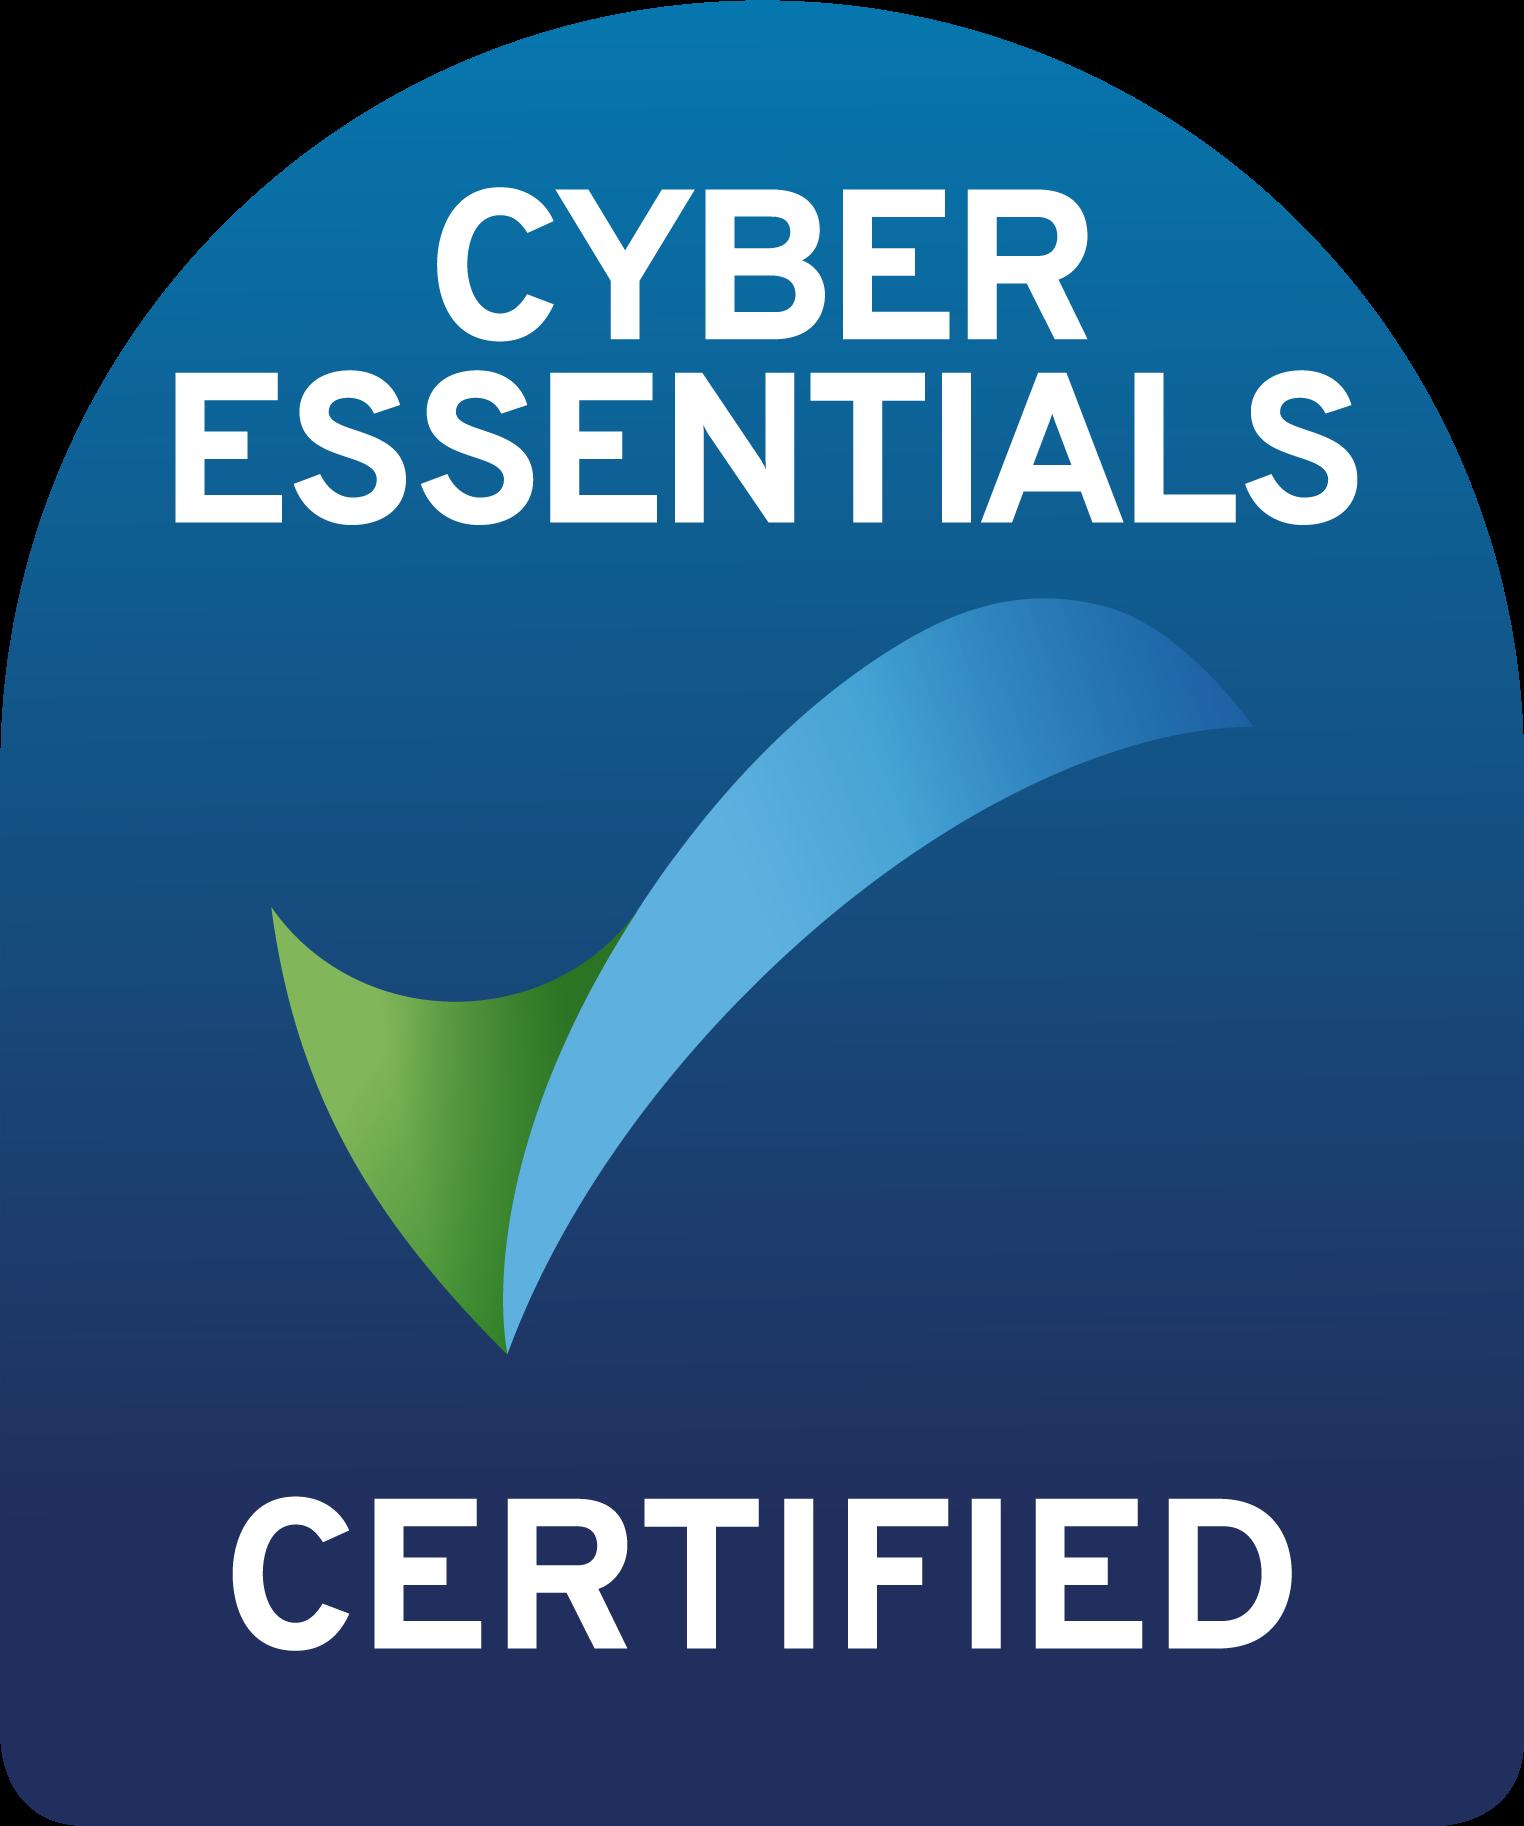 cyber-essentials-certified